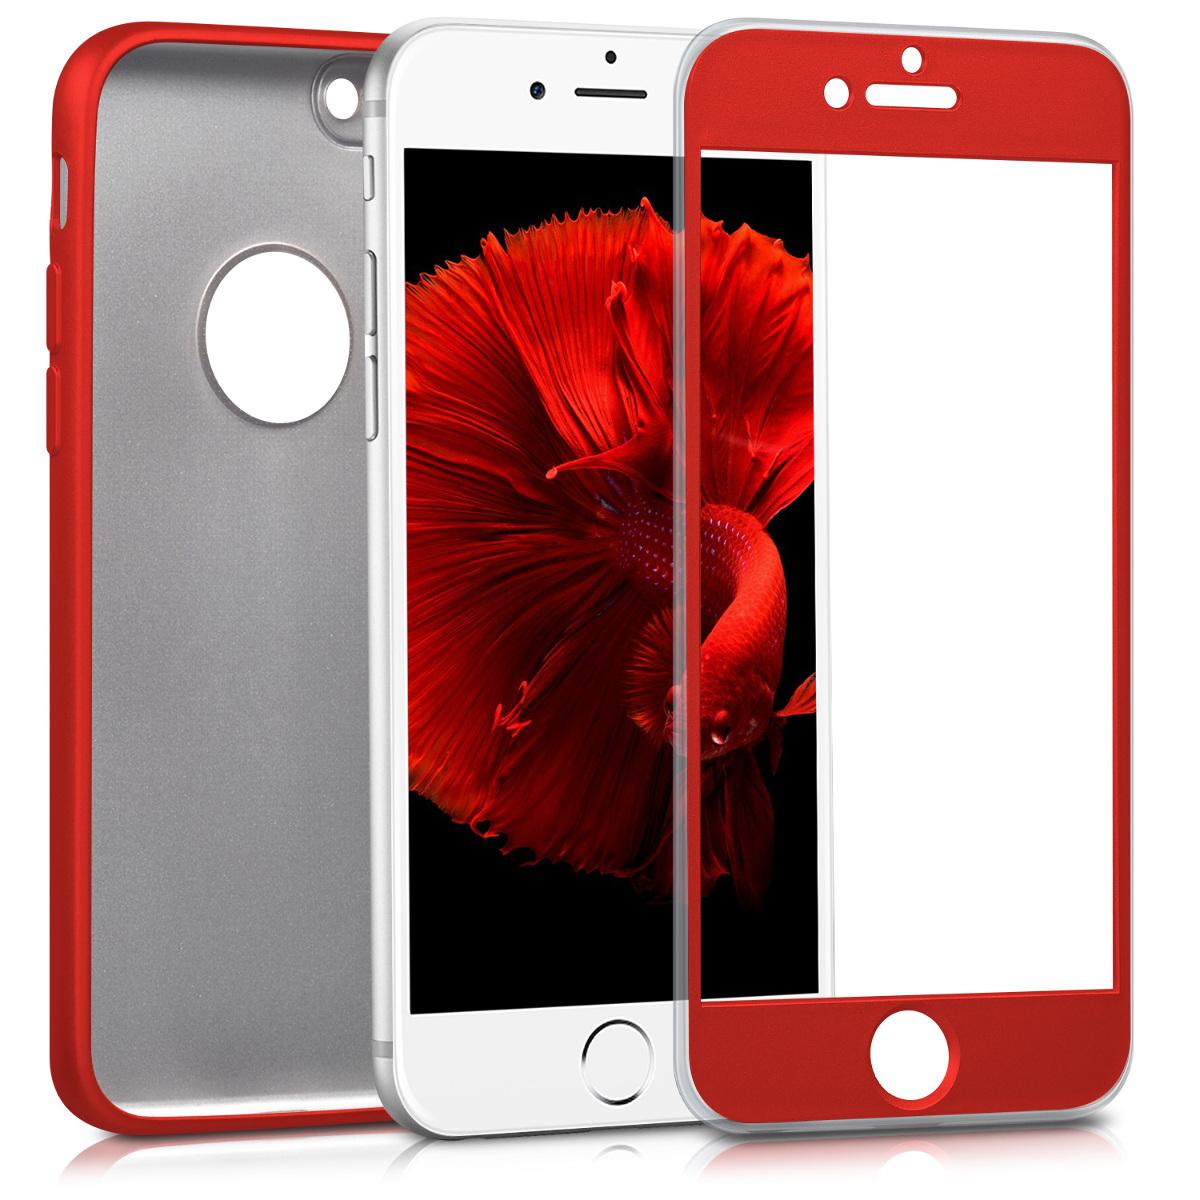 KW Θήκη Σιλικόνης Full Body Apple iPhone 7 - Metallic Dark Red (42646.36)